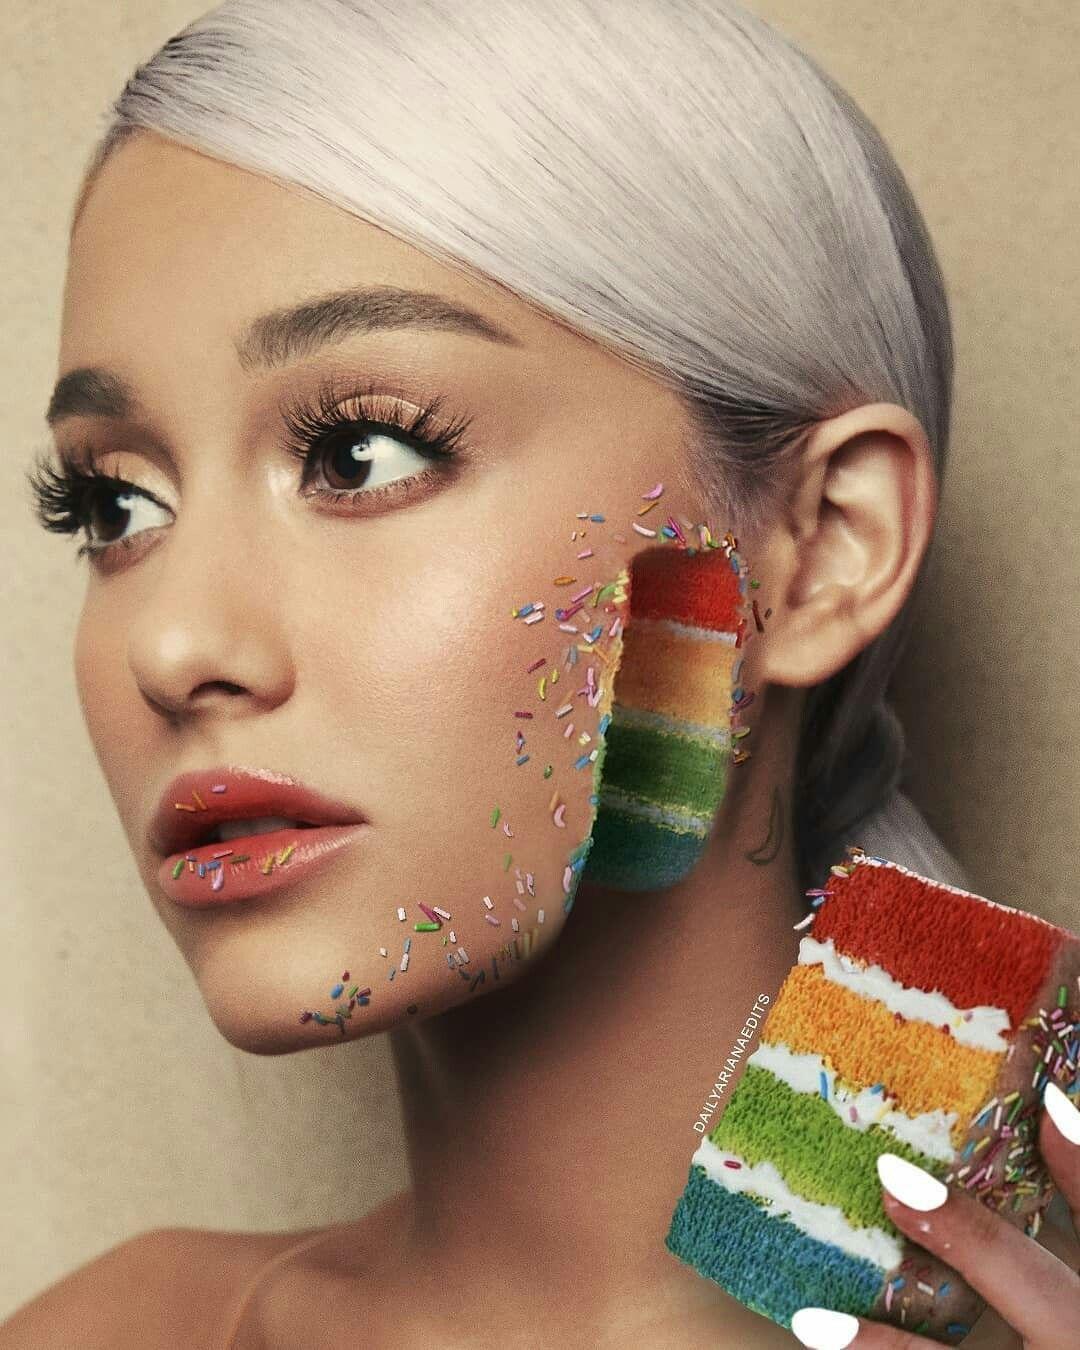 Pin by ShiyanAdore on Ariana grande Ariana grande